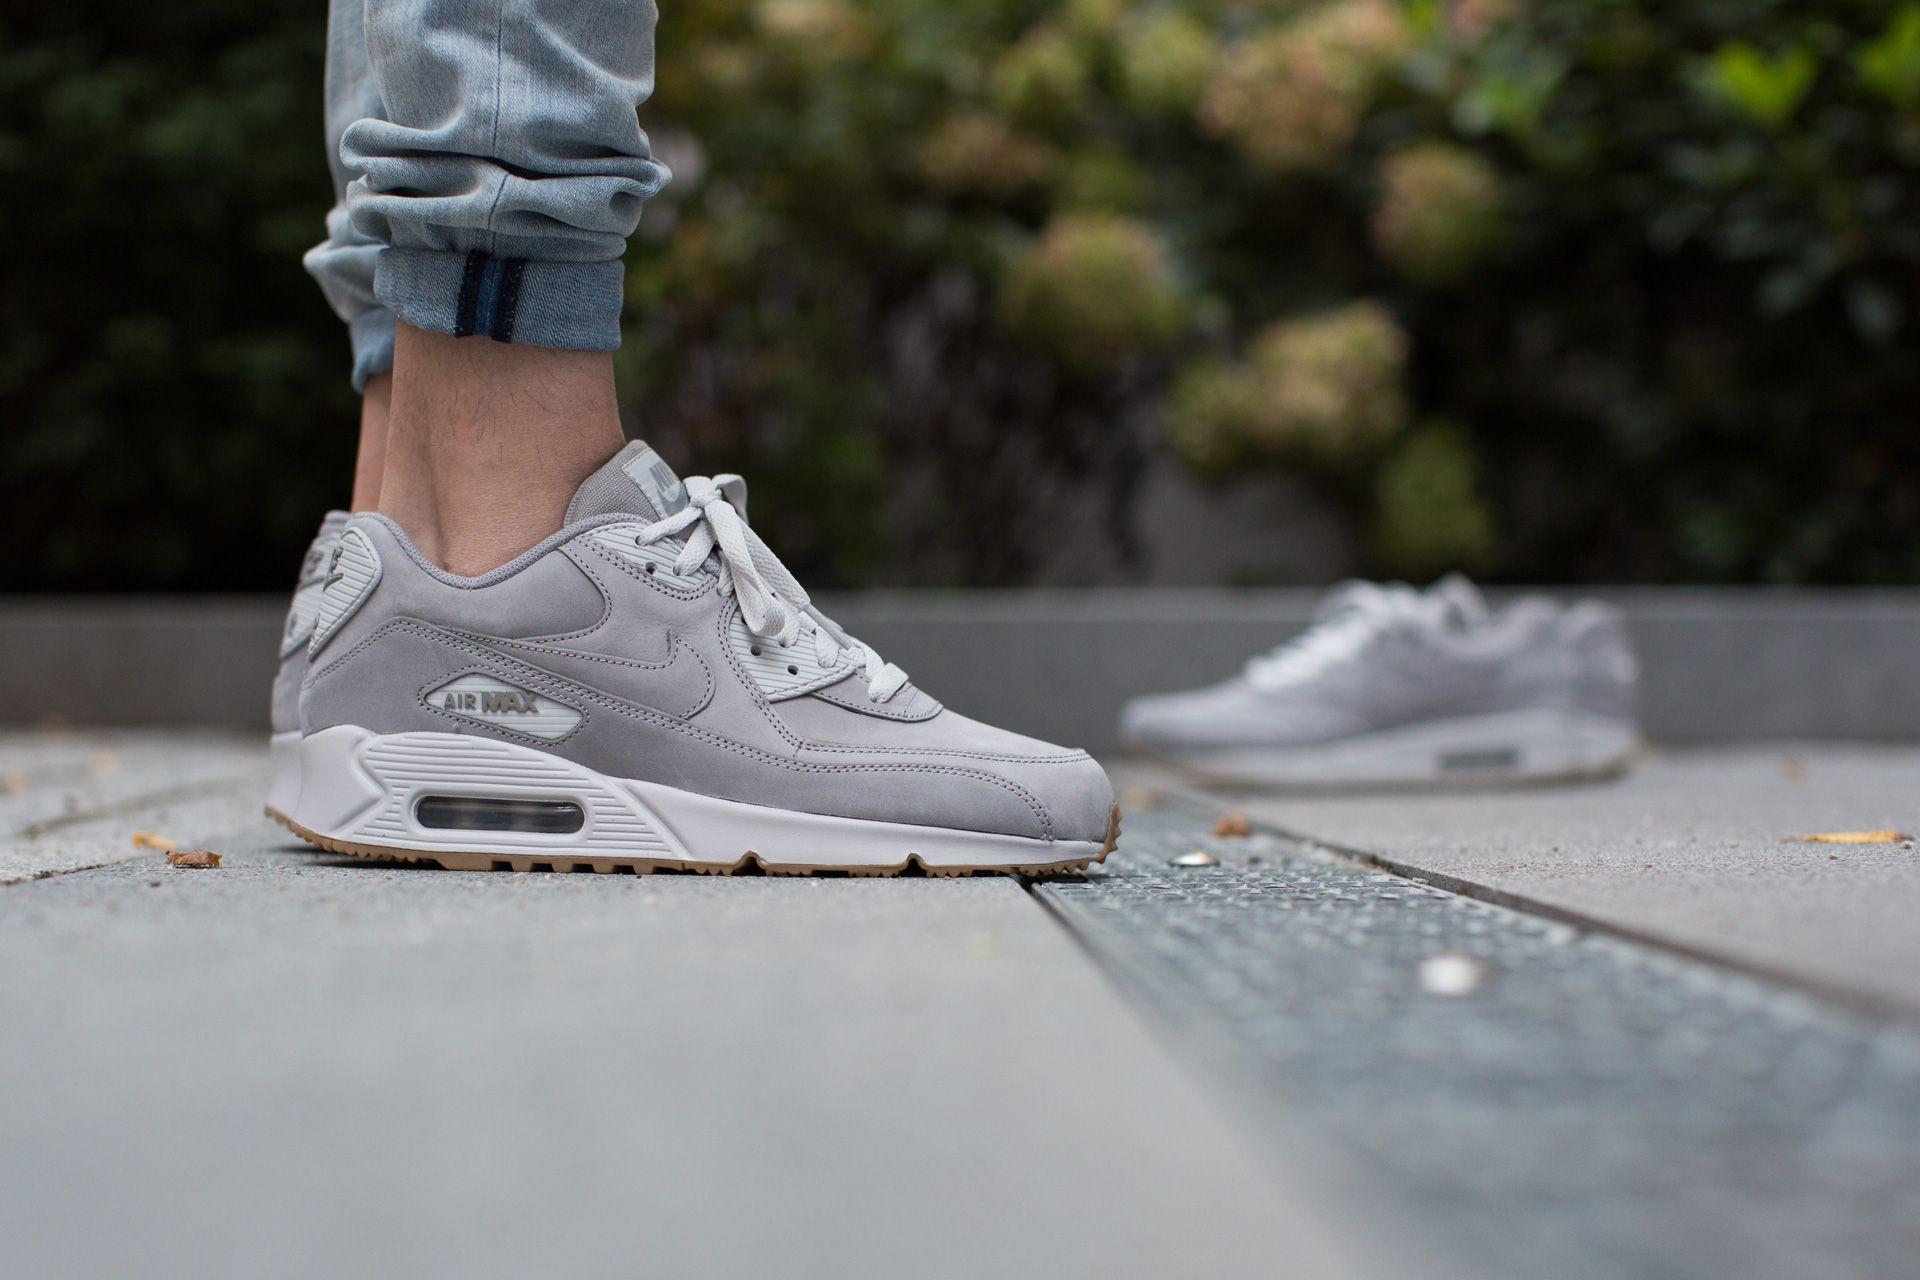 Nike Air Max 90 Winter Premium Medium Grey | SneakerFiles